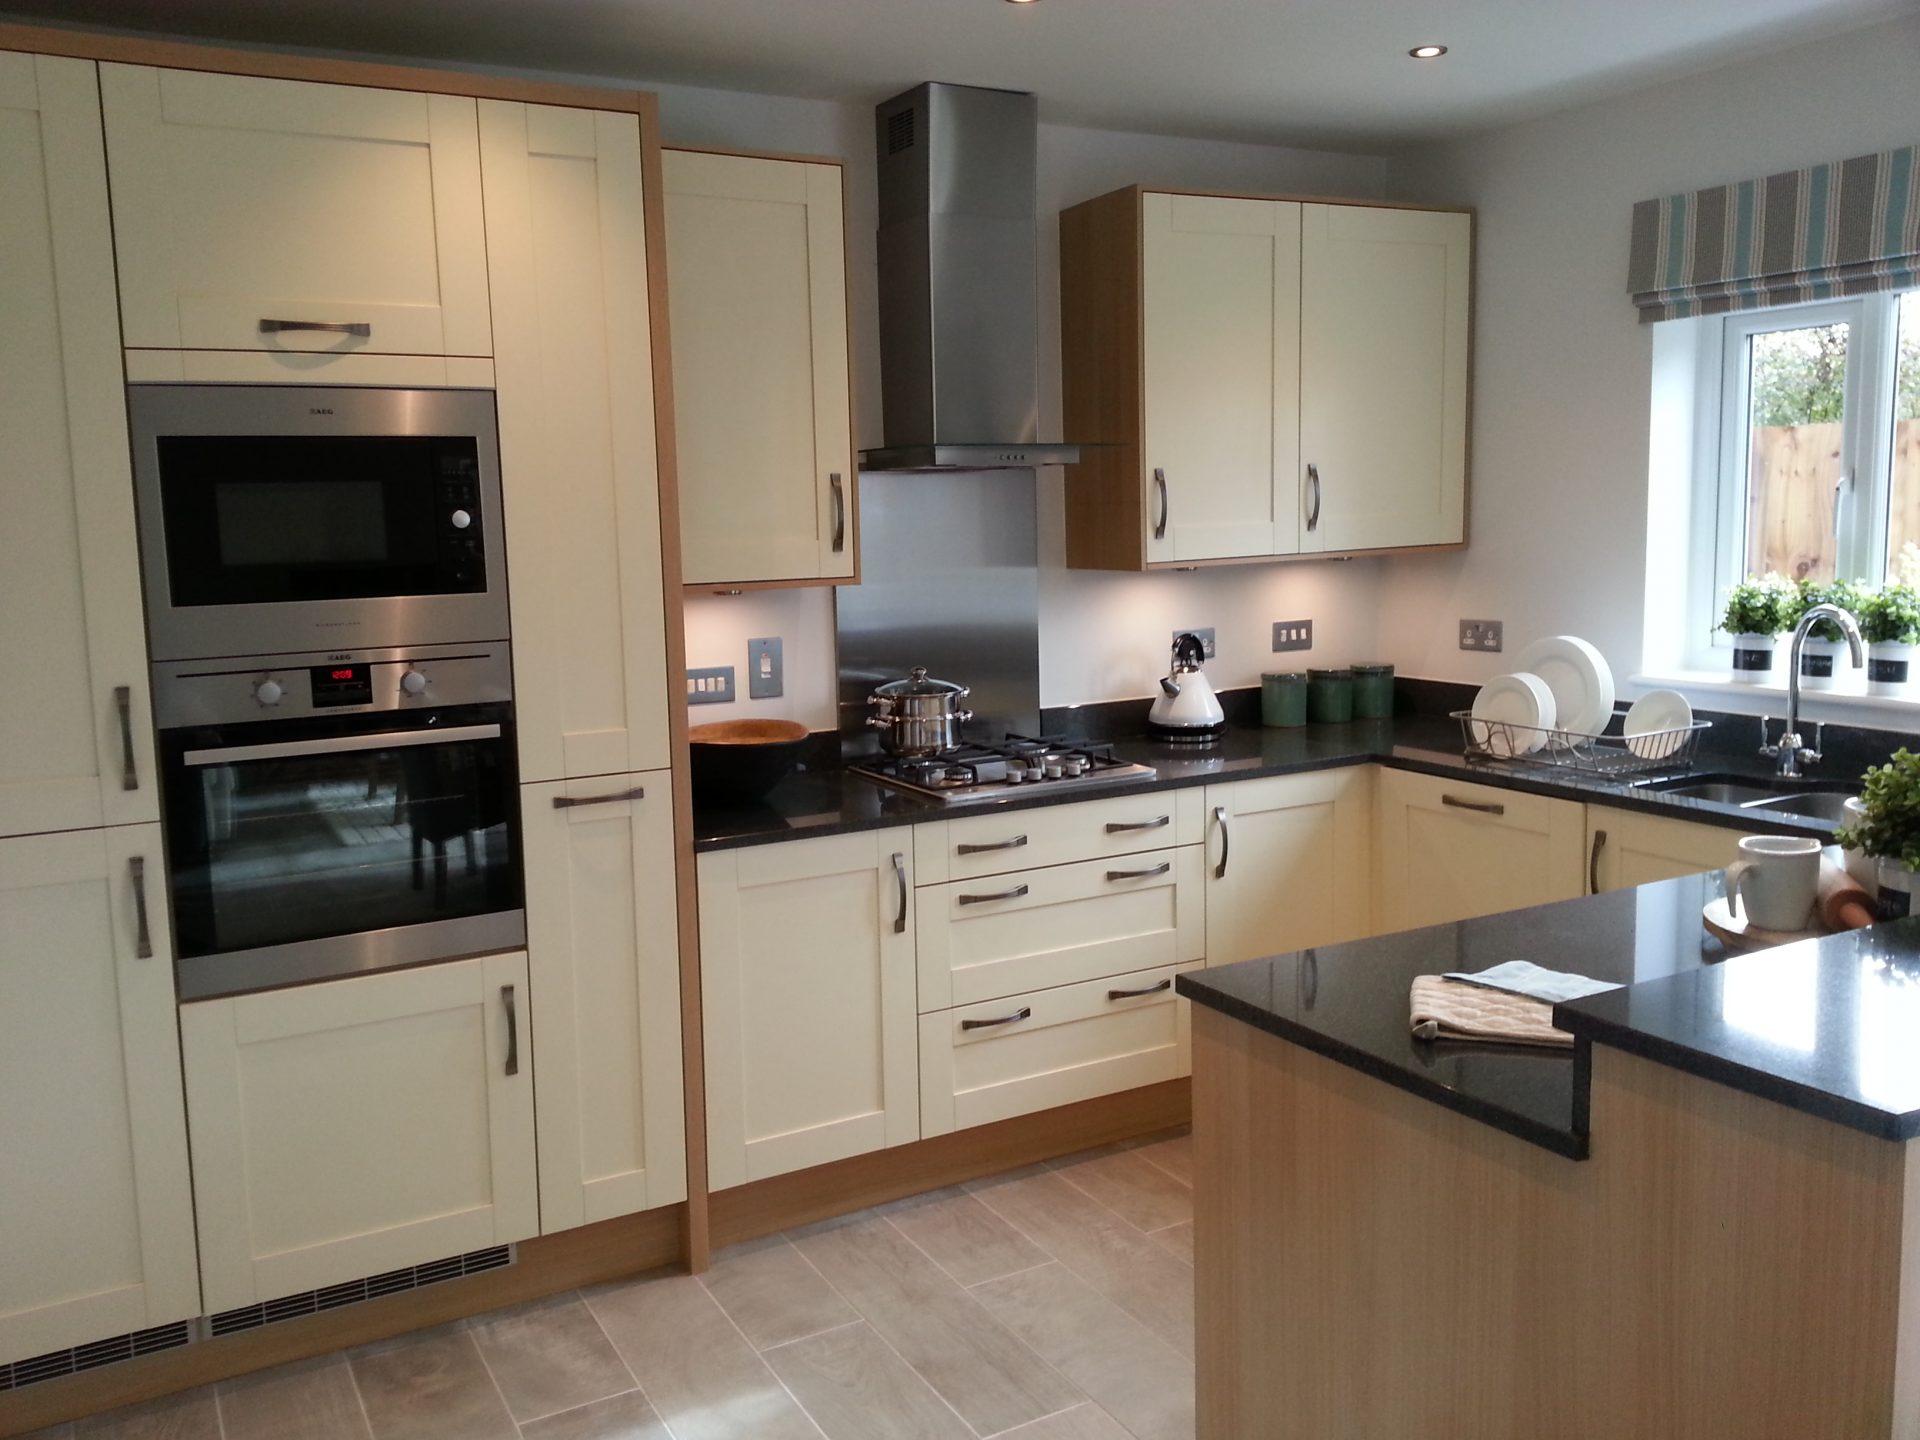 Gala Oyster British Kitchen Design - Shropshire